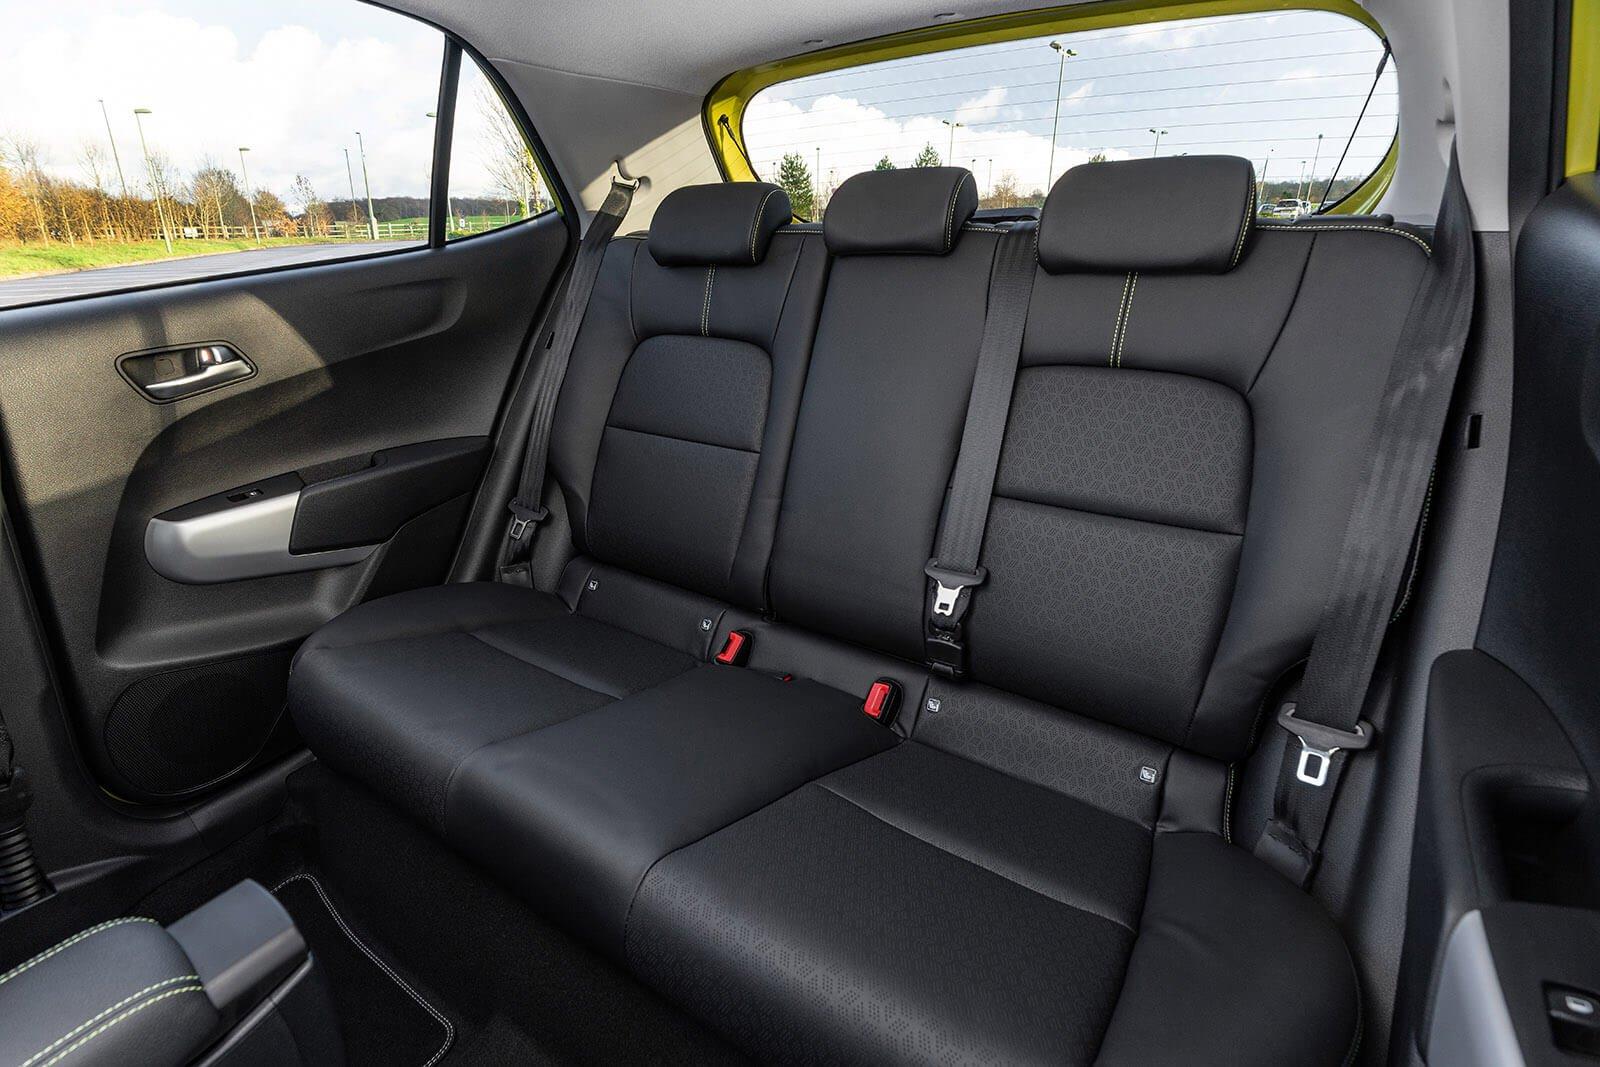 Kia Picanto 2021 Rear seats